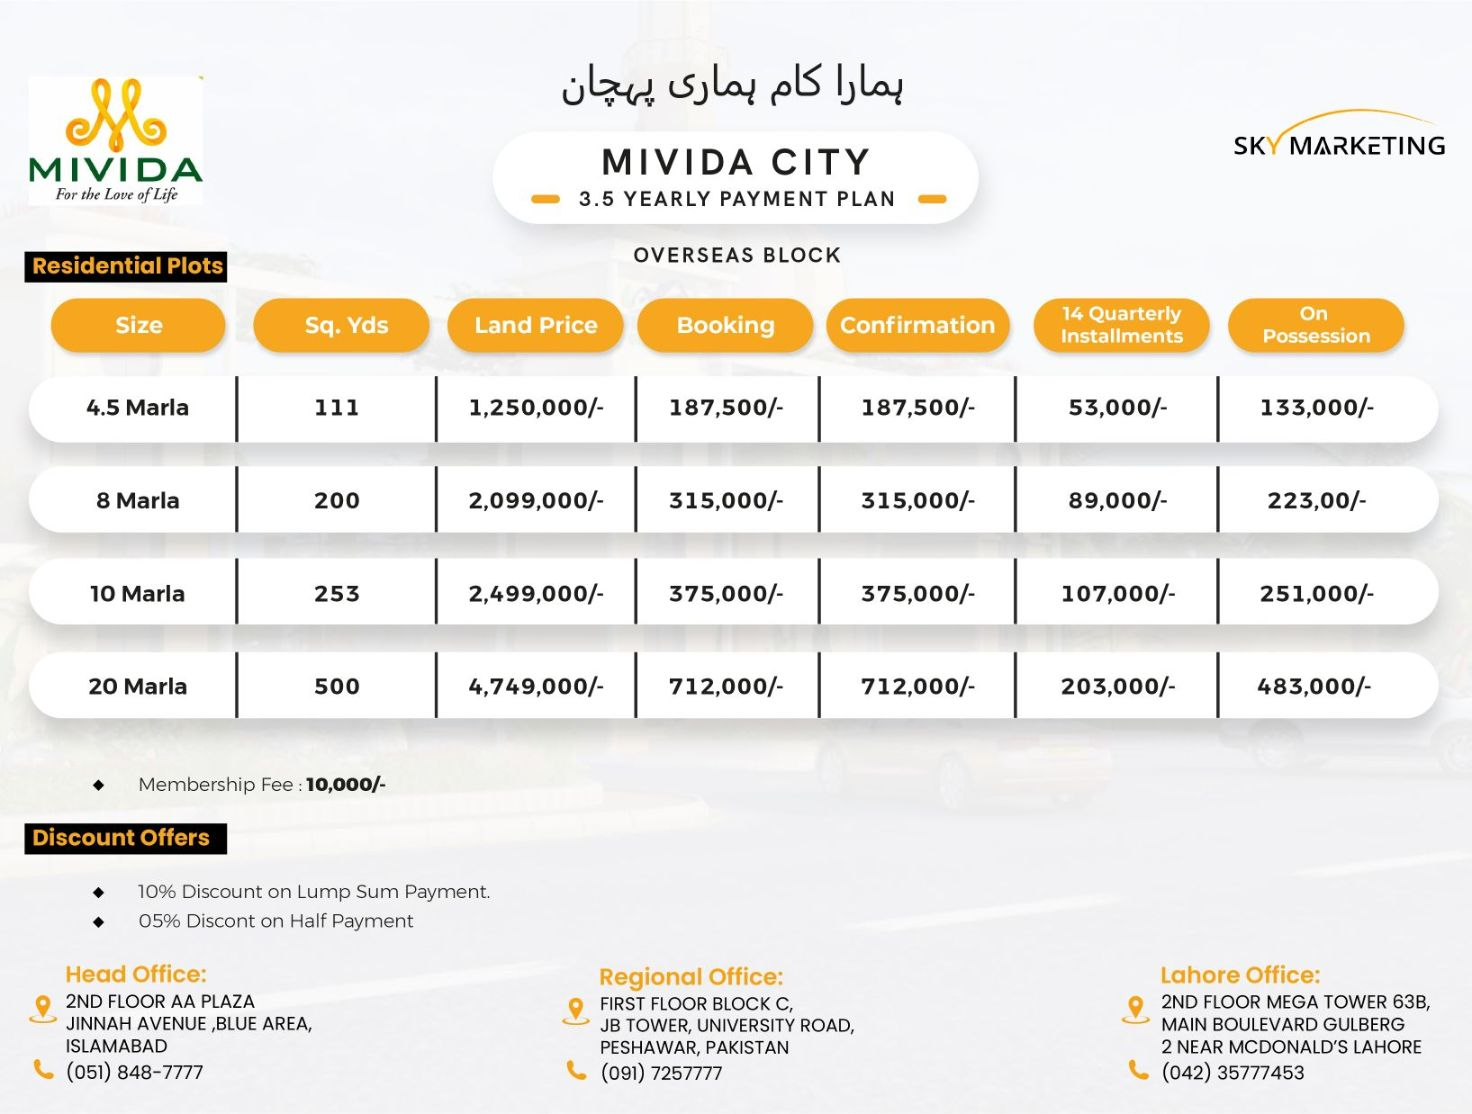 Mivida City Islamabad Residential Plots Payment Plan